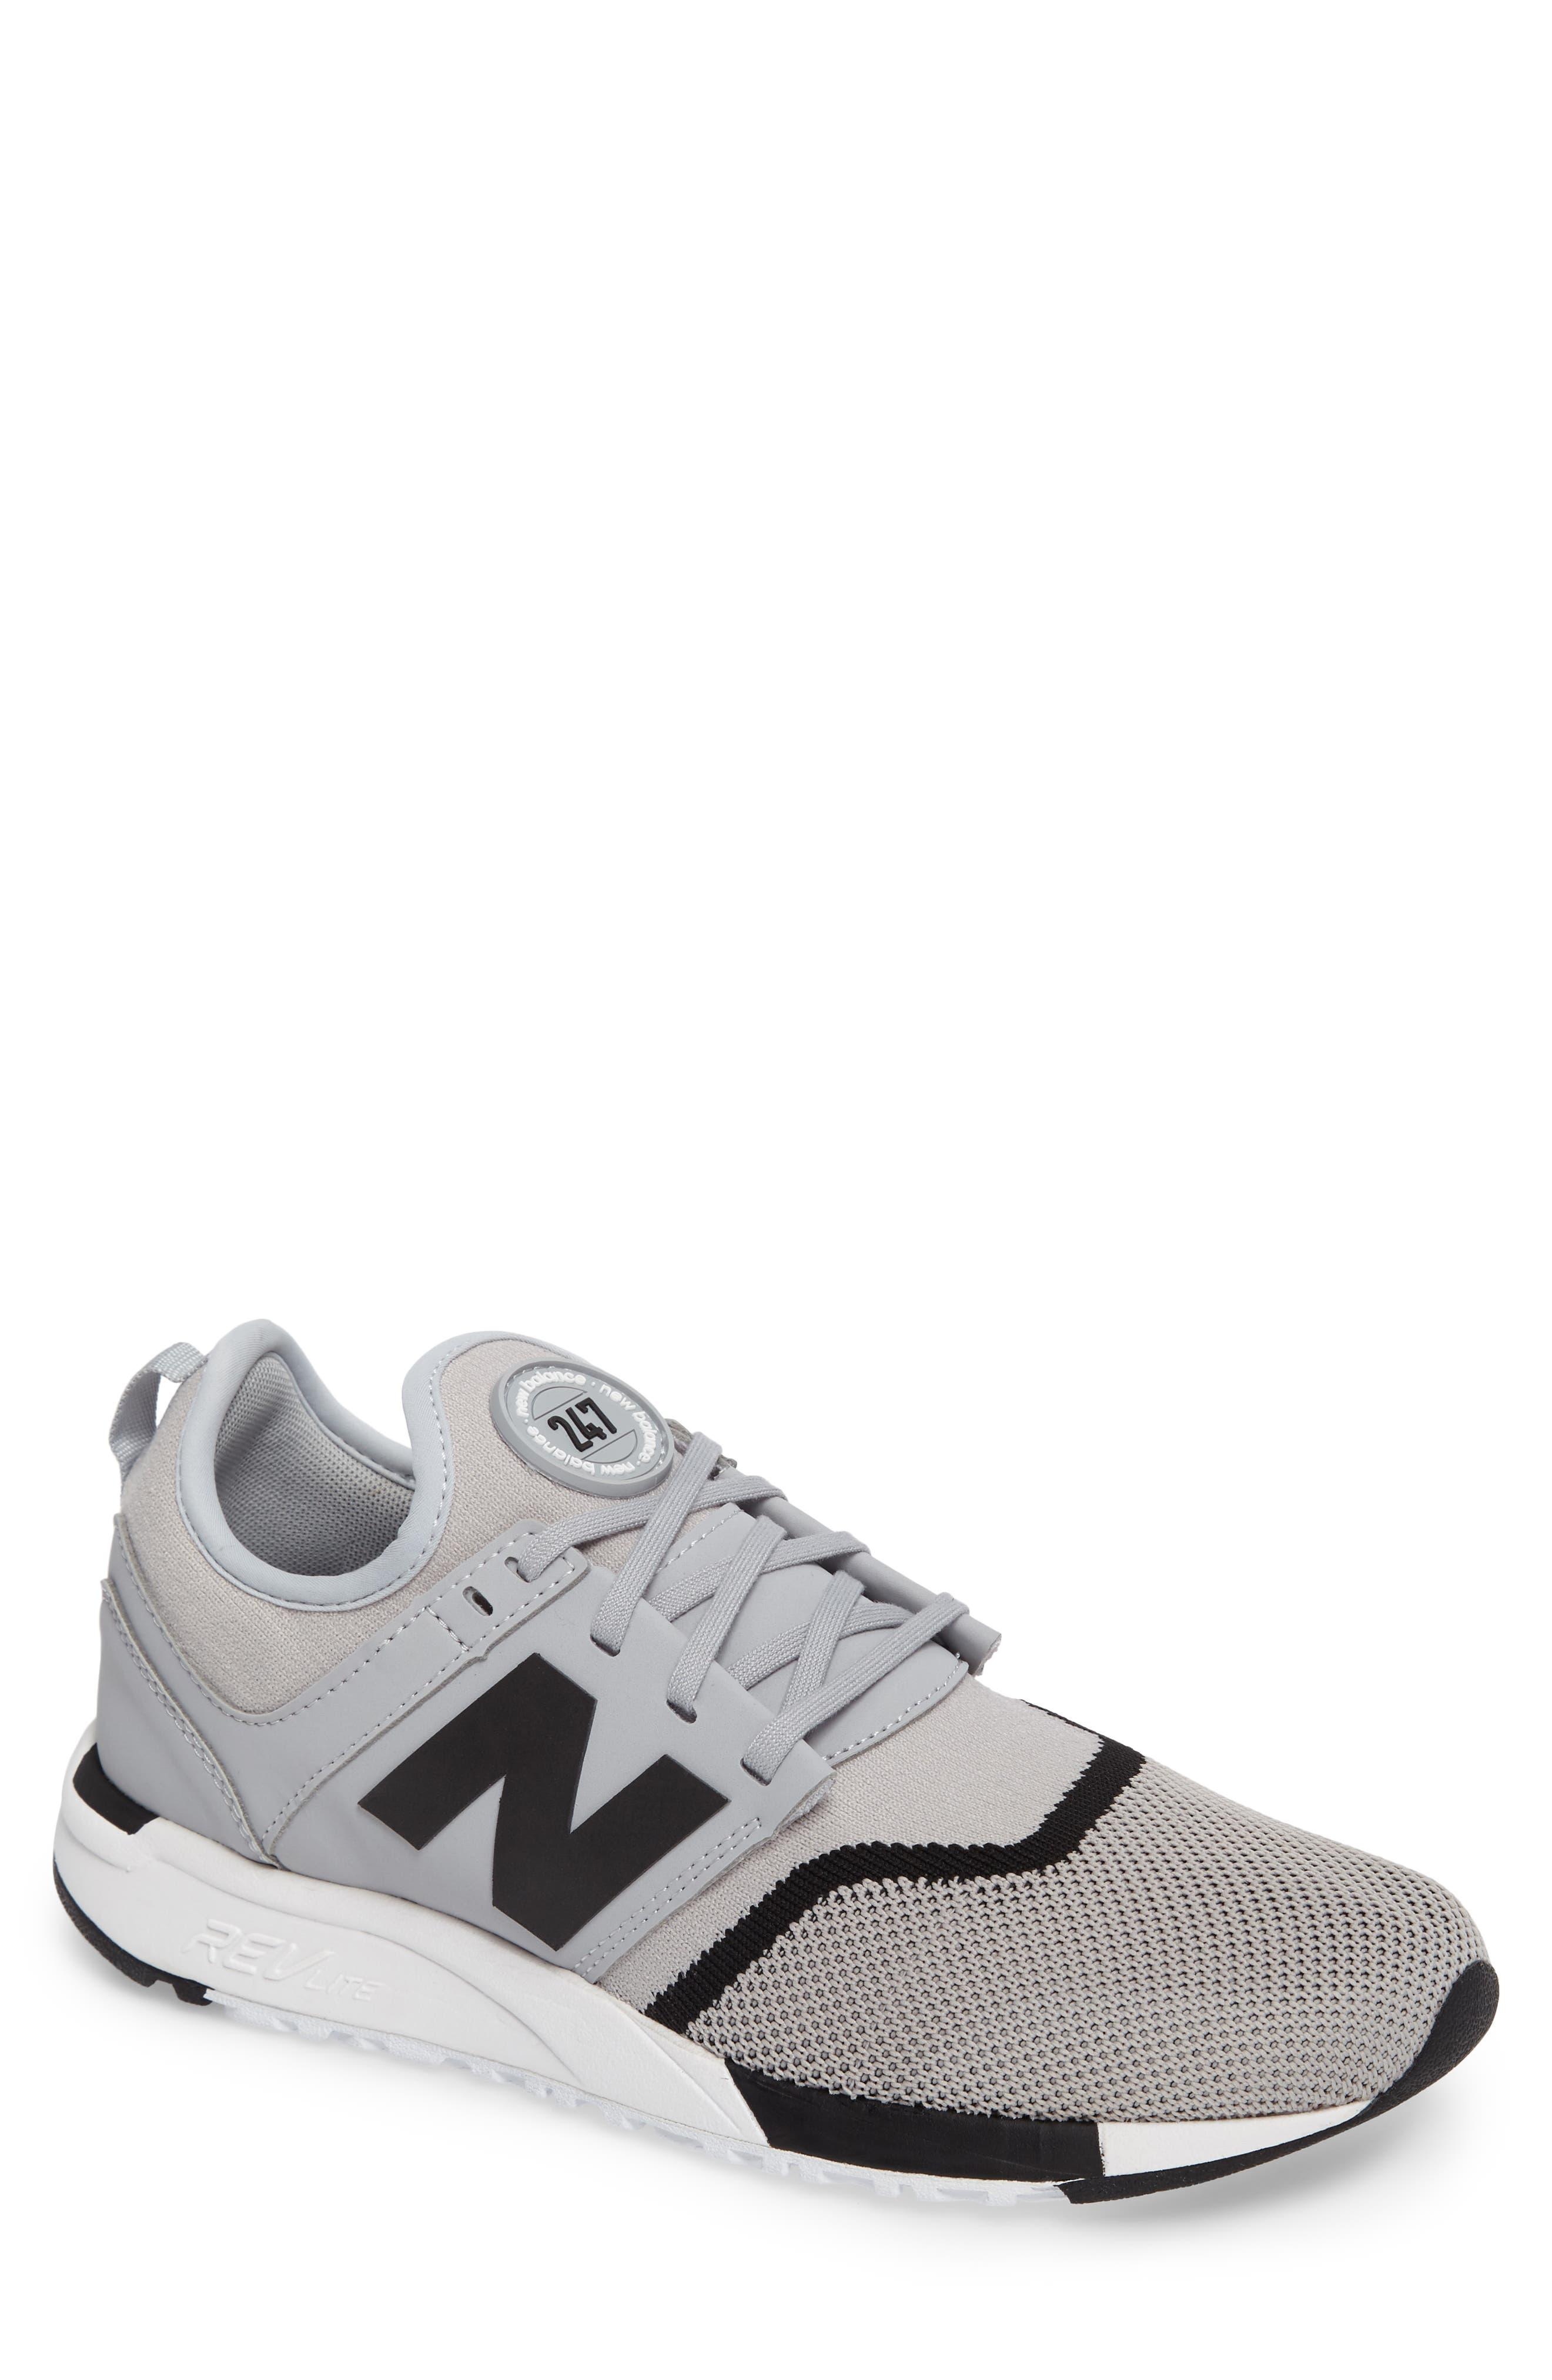 247 Sport Knit Sneaker,                             Main thumbnail 1, color,                             030